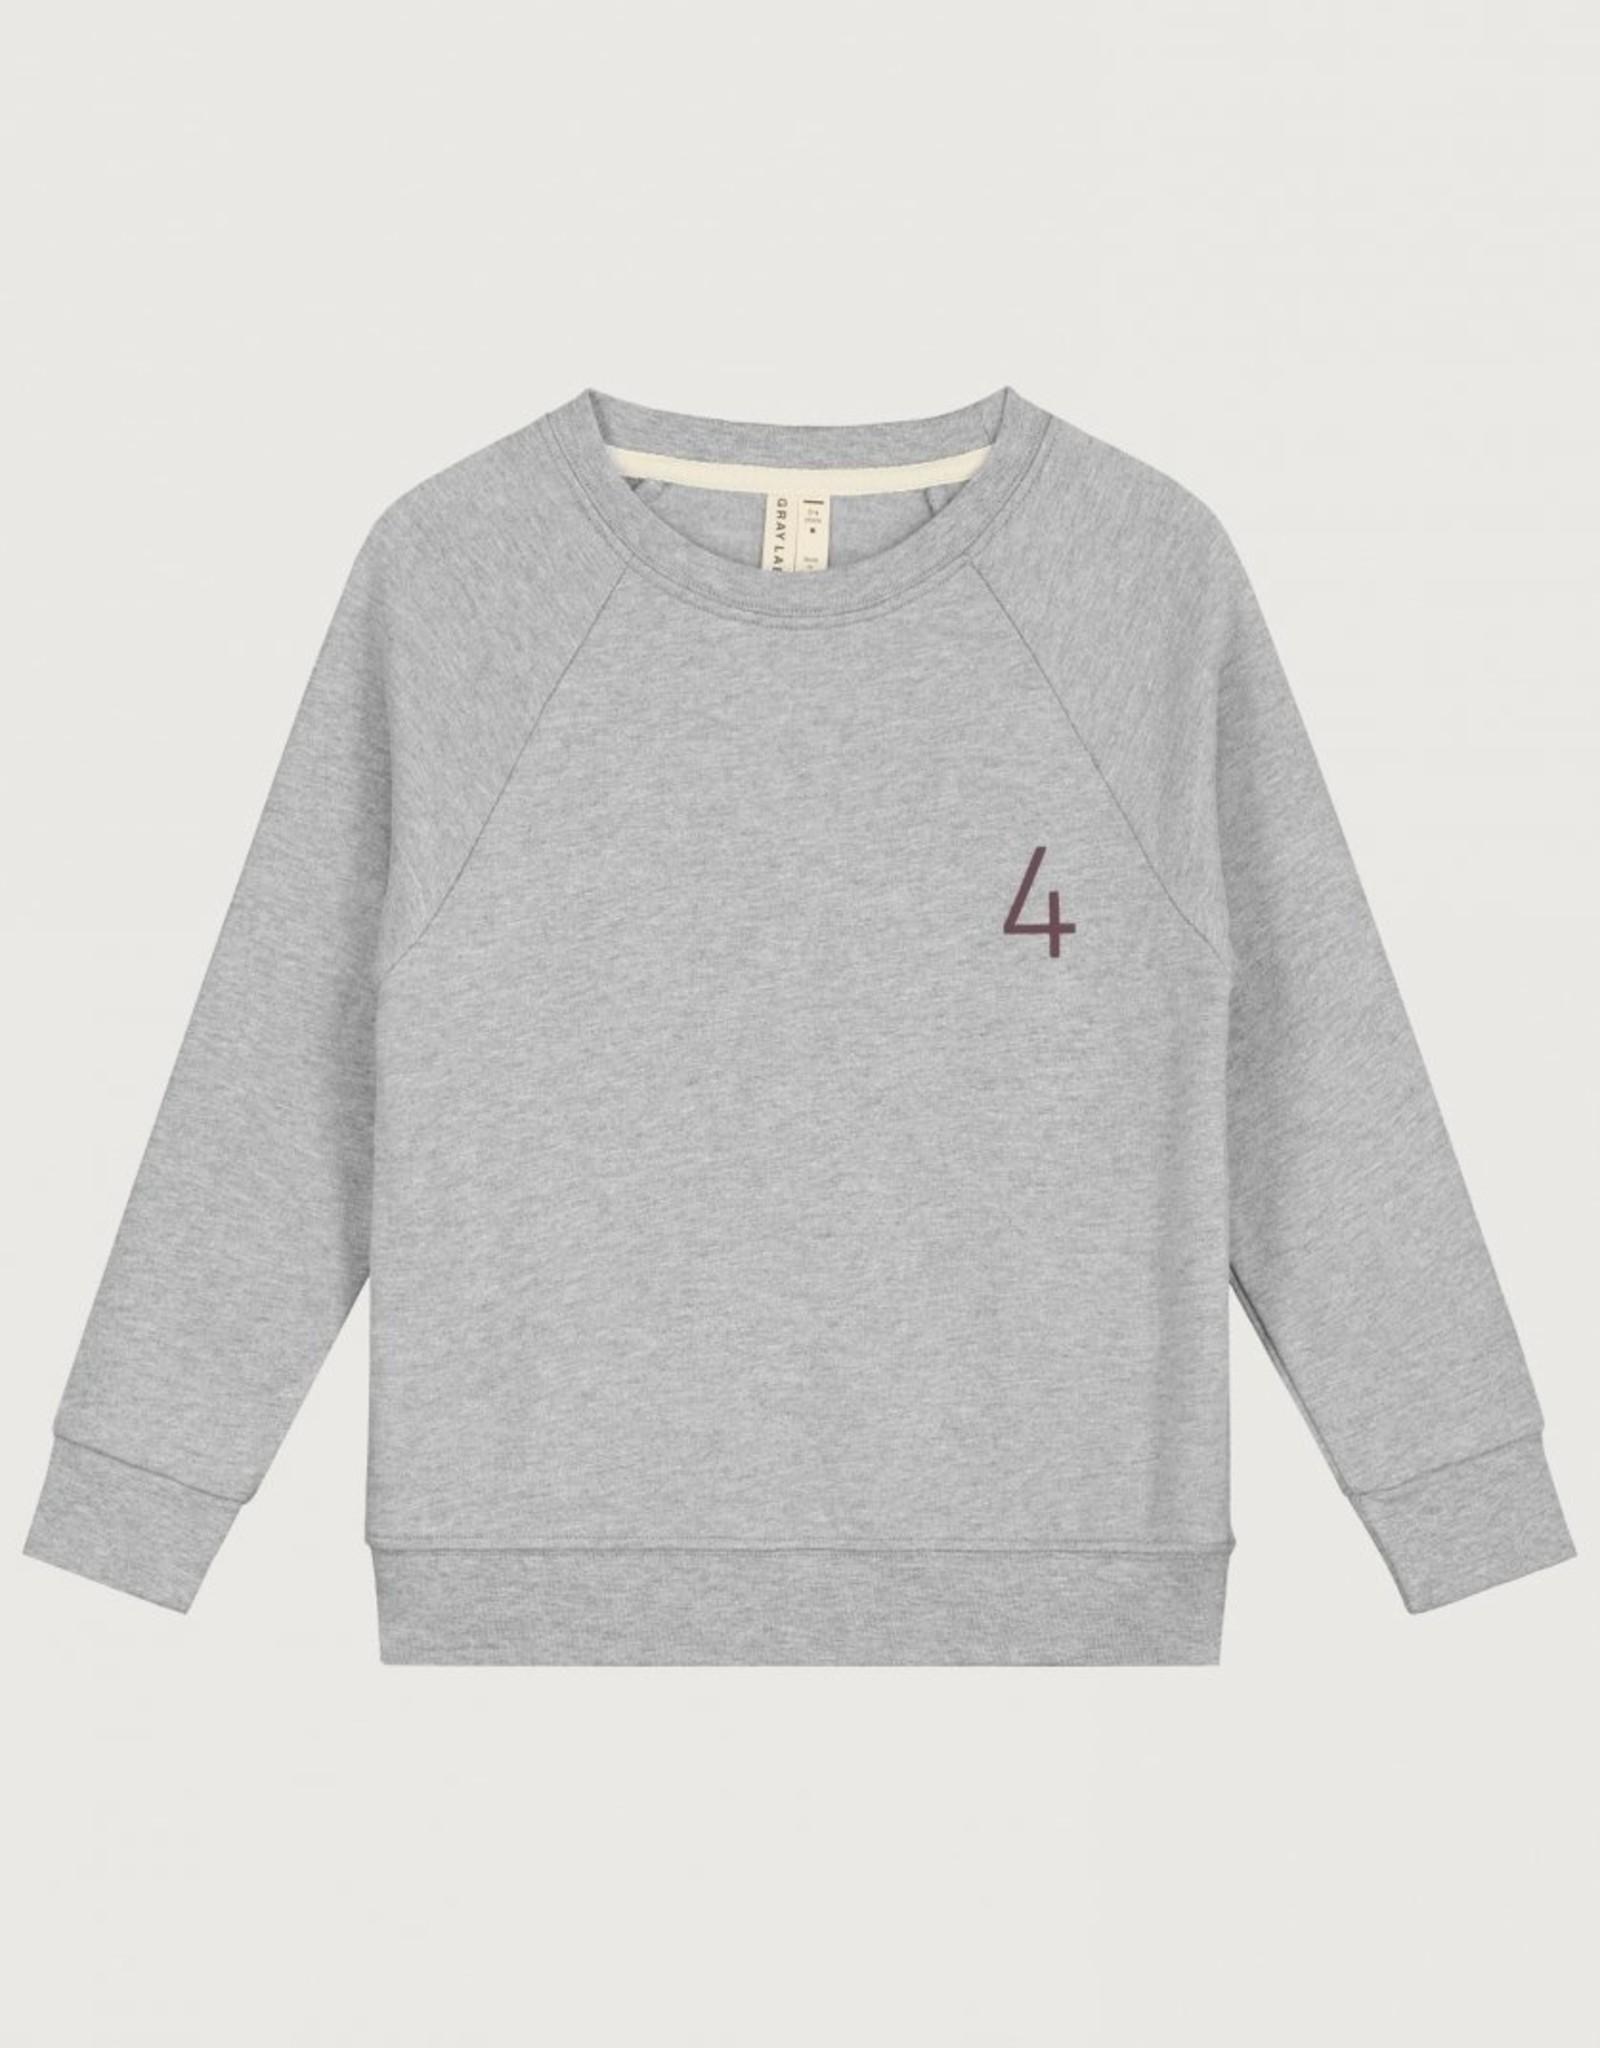 Gray Label Gray Label sweater 4 in grey melange